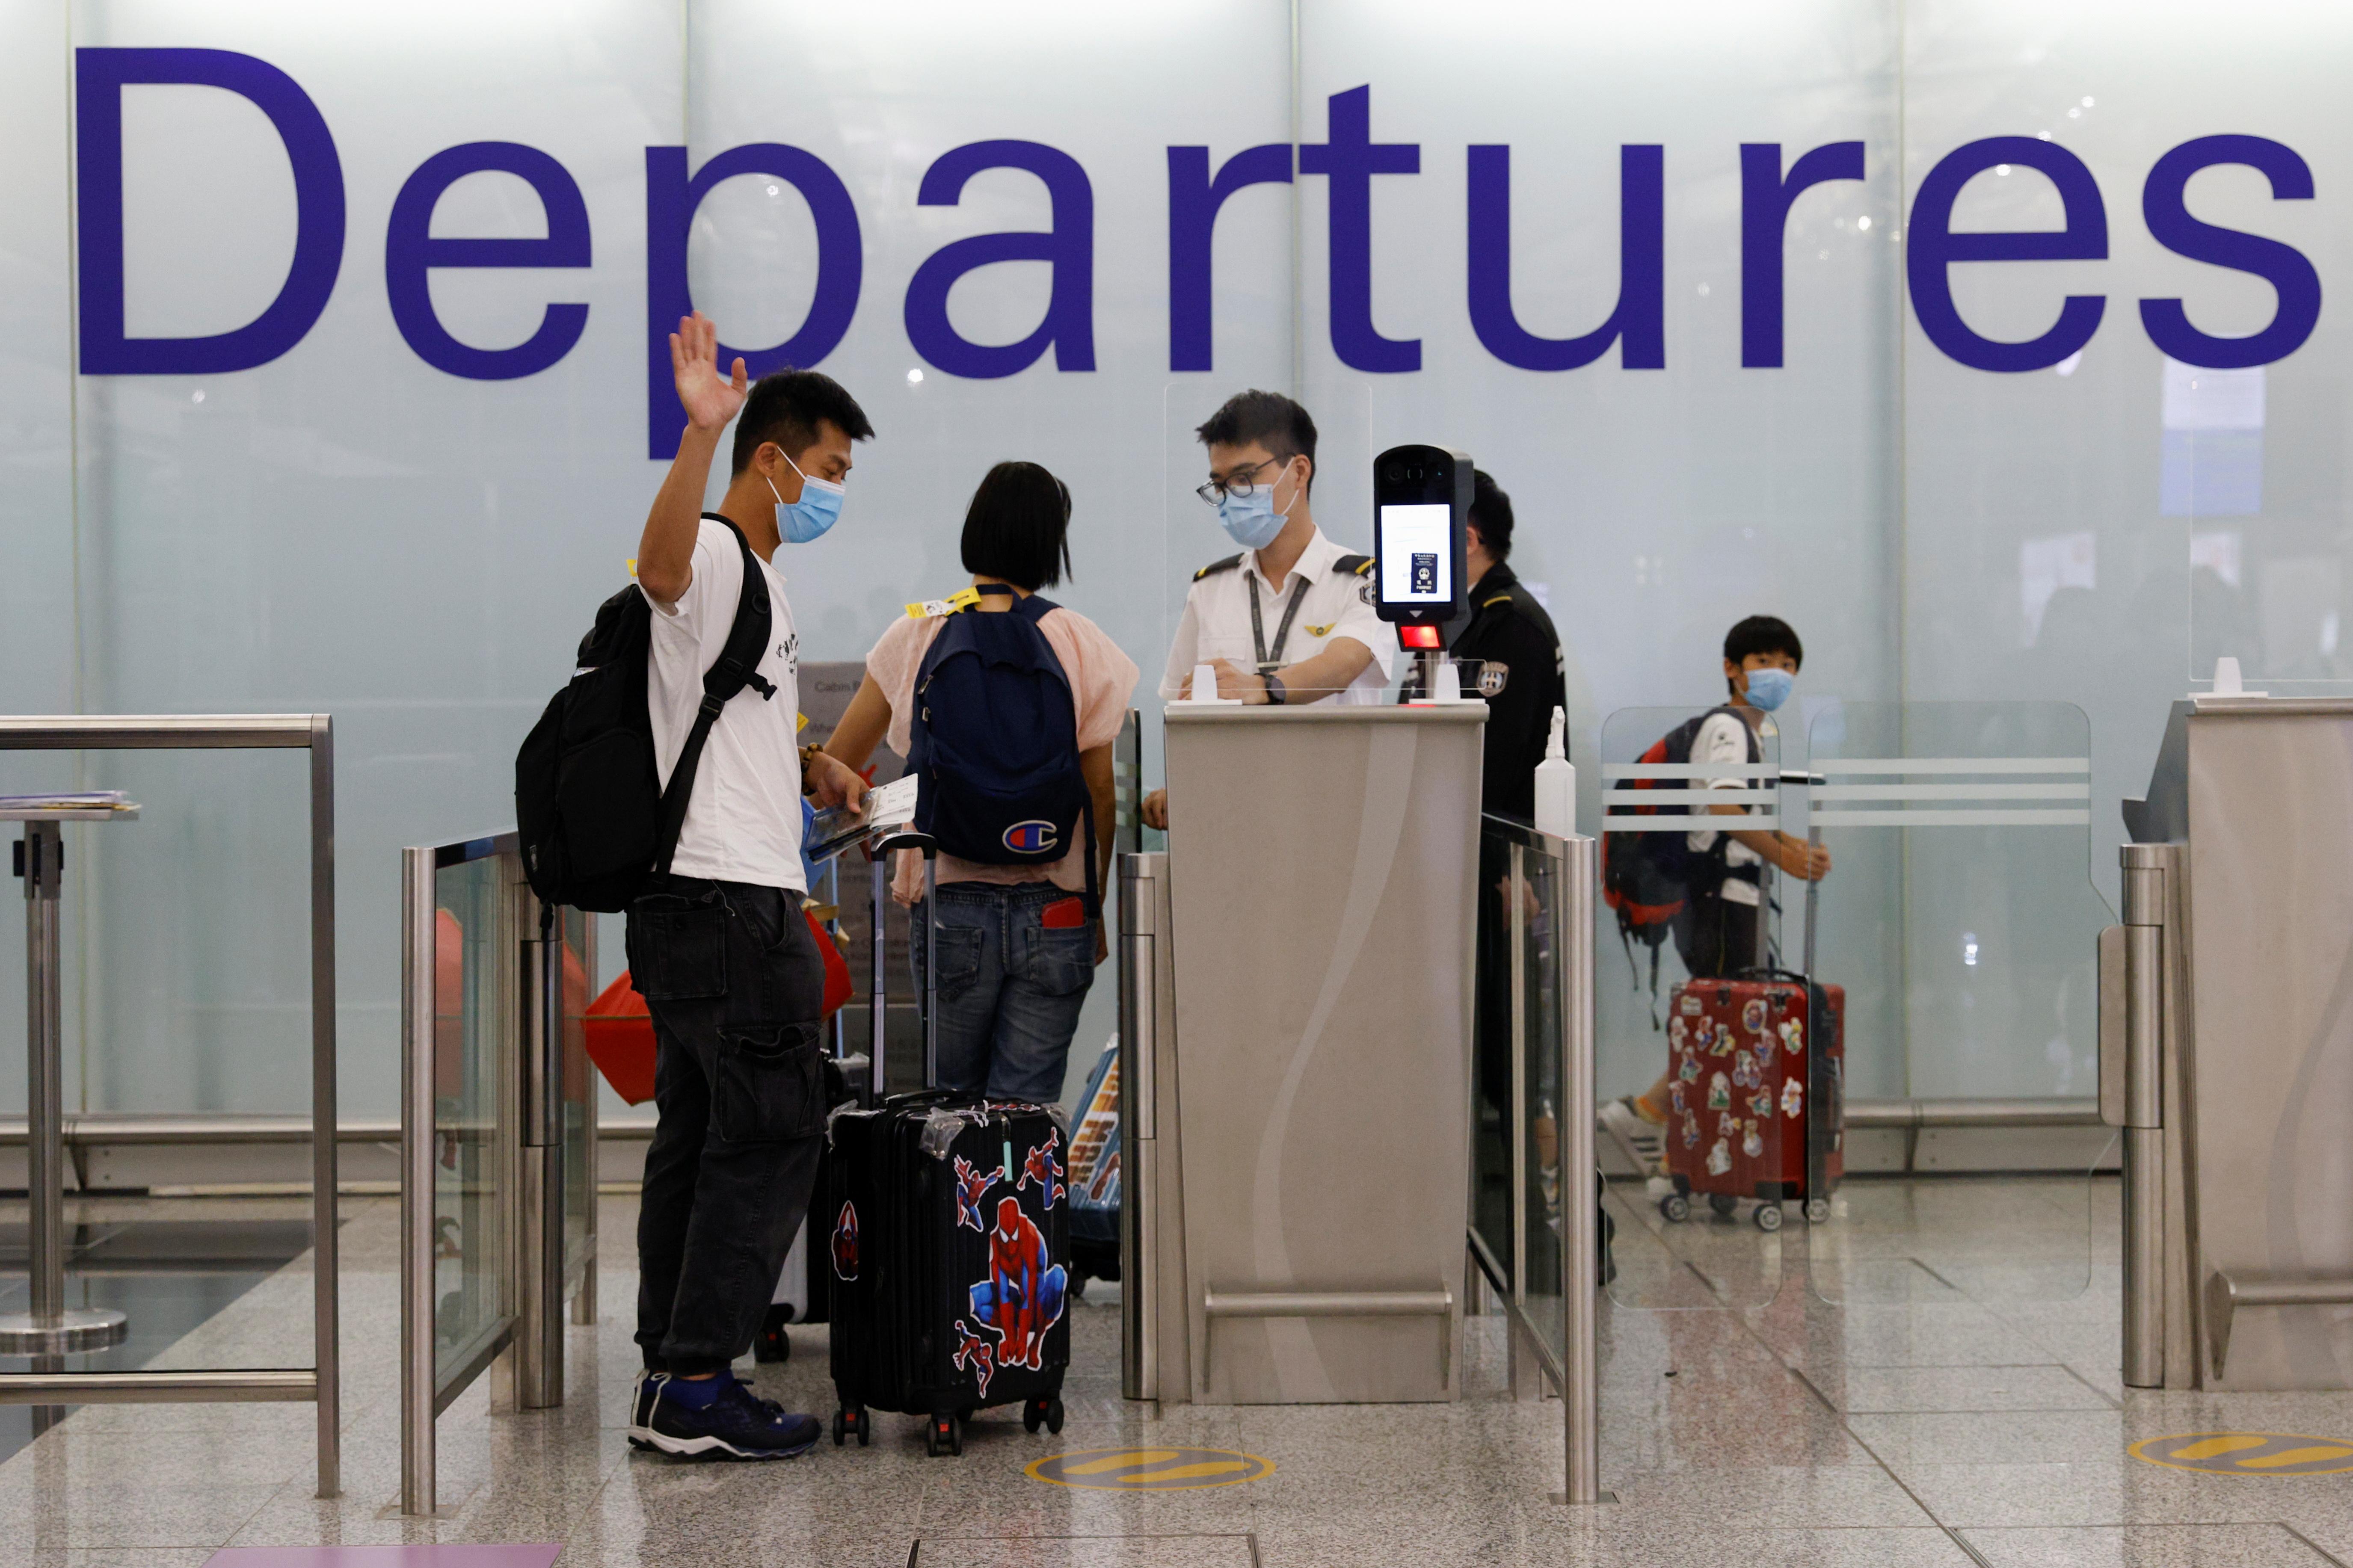 A man waves to his family members before departing to United Kingdom at the Hong Kong International Airport in Hong Kong, China June 30, 2021. REUTERS/Tyrone Siu